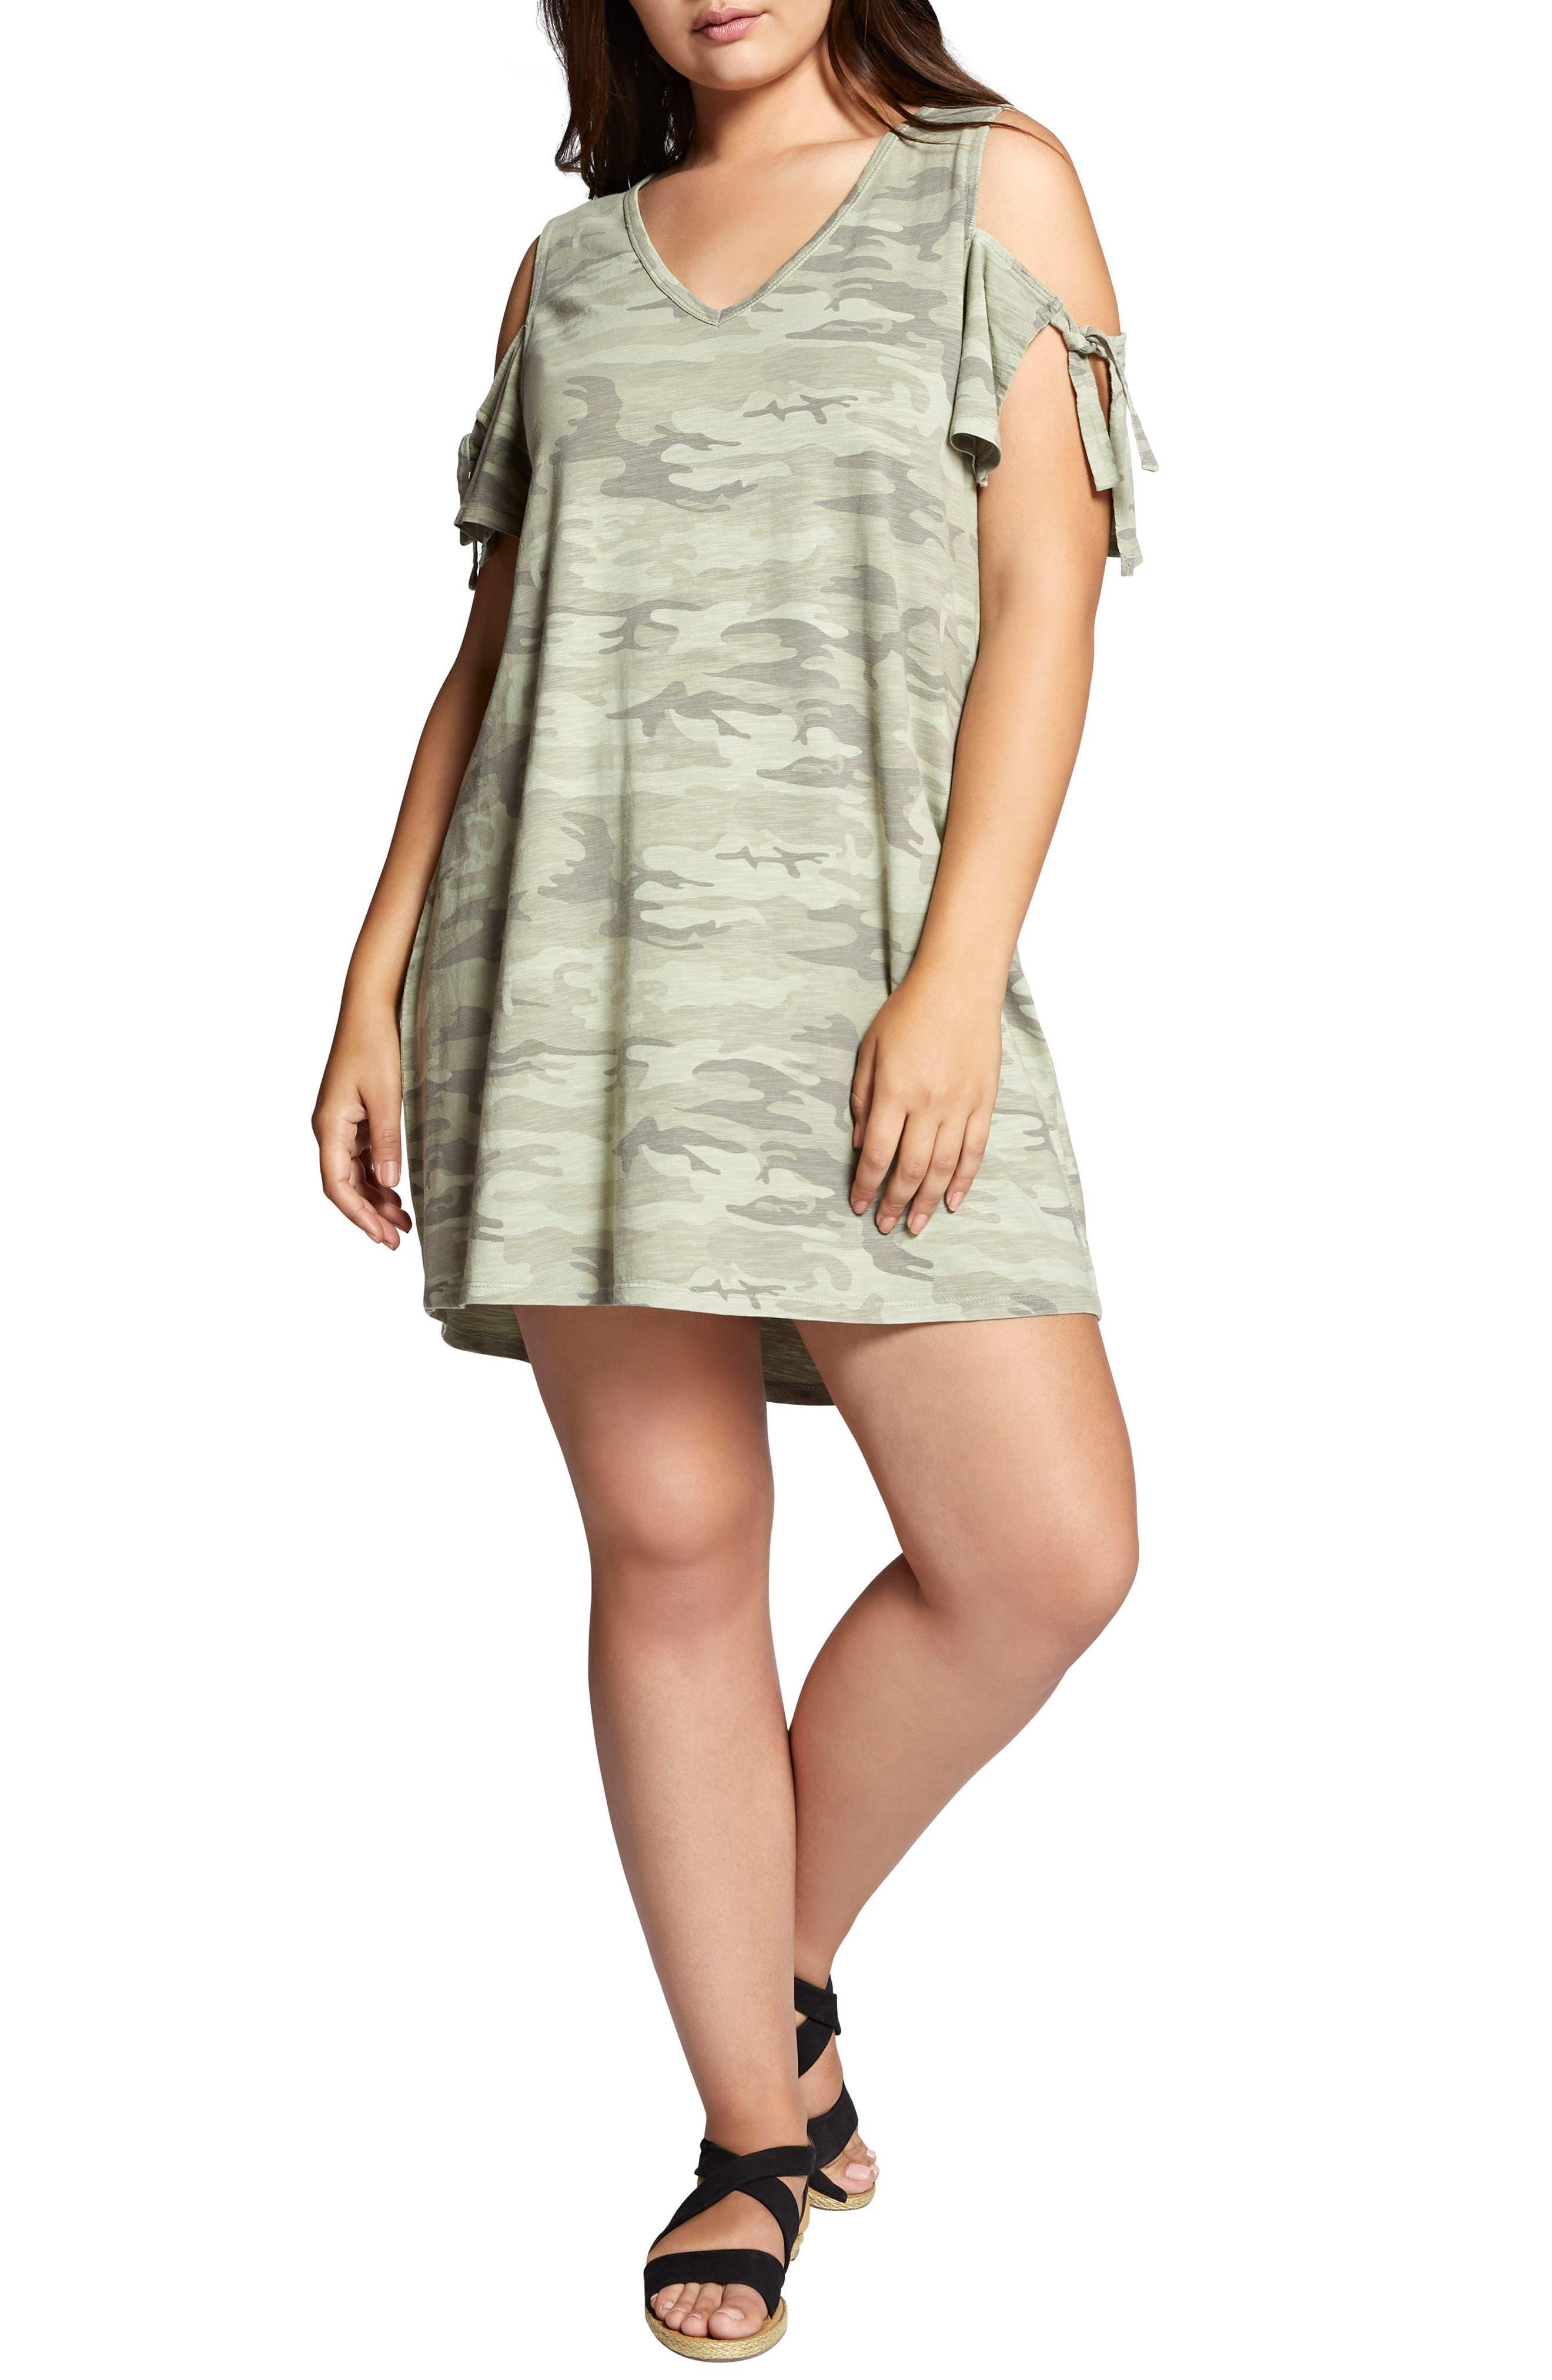 Lakeside Camo Cold Shoulder T-Shirt Dress,                         Main,                         color, CADET CAMO